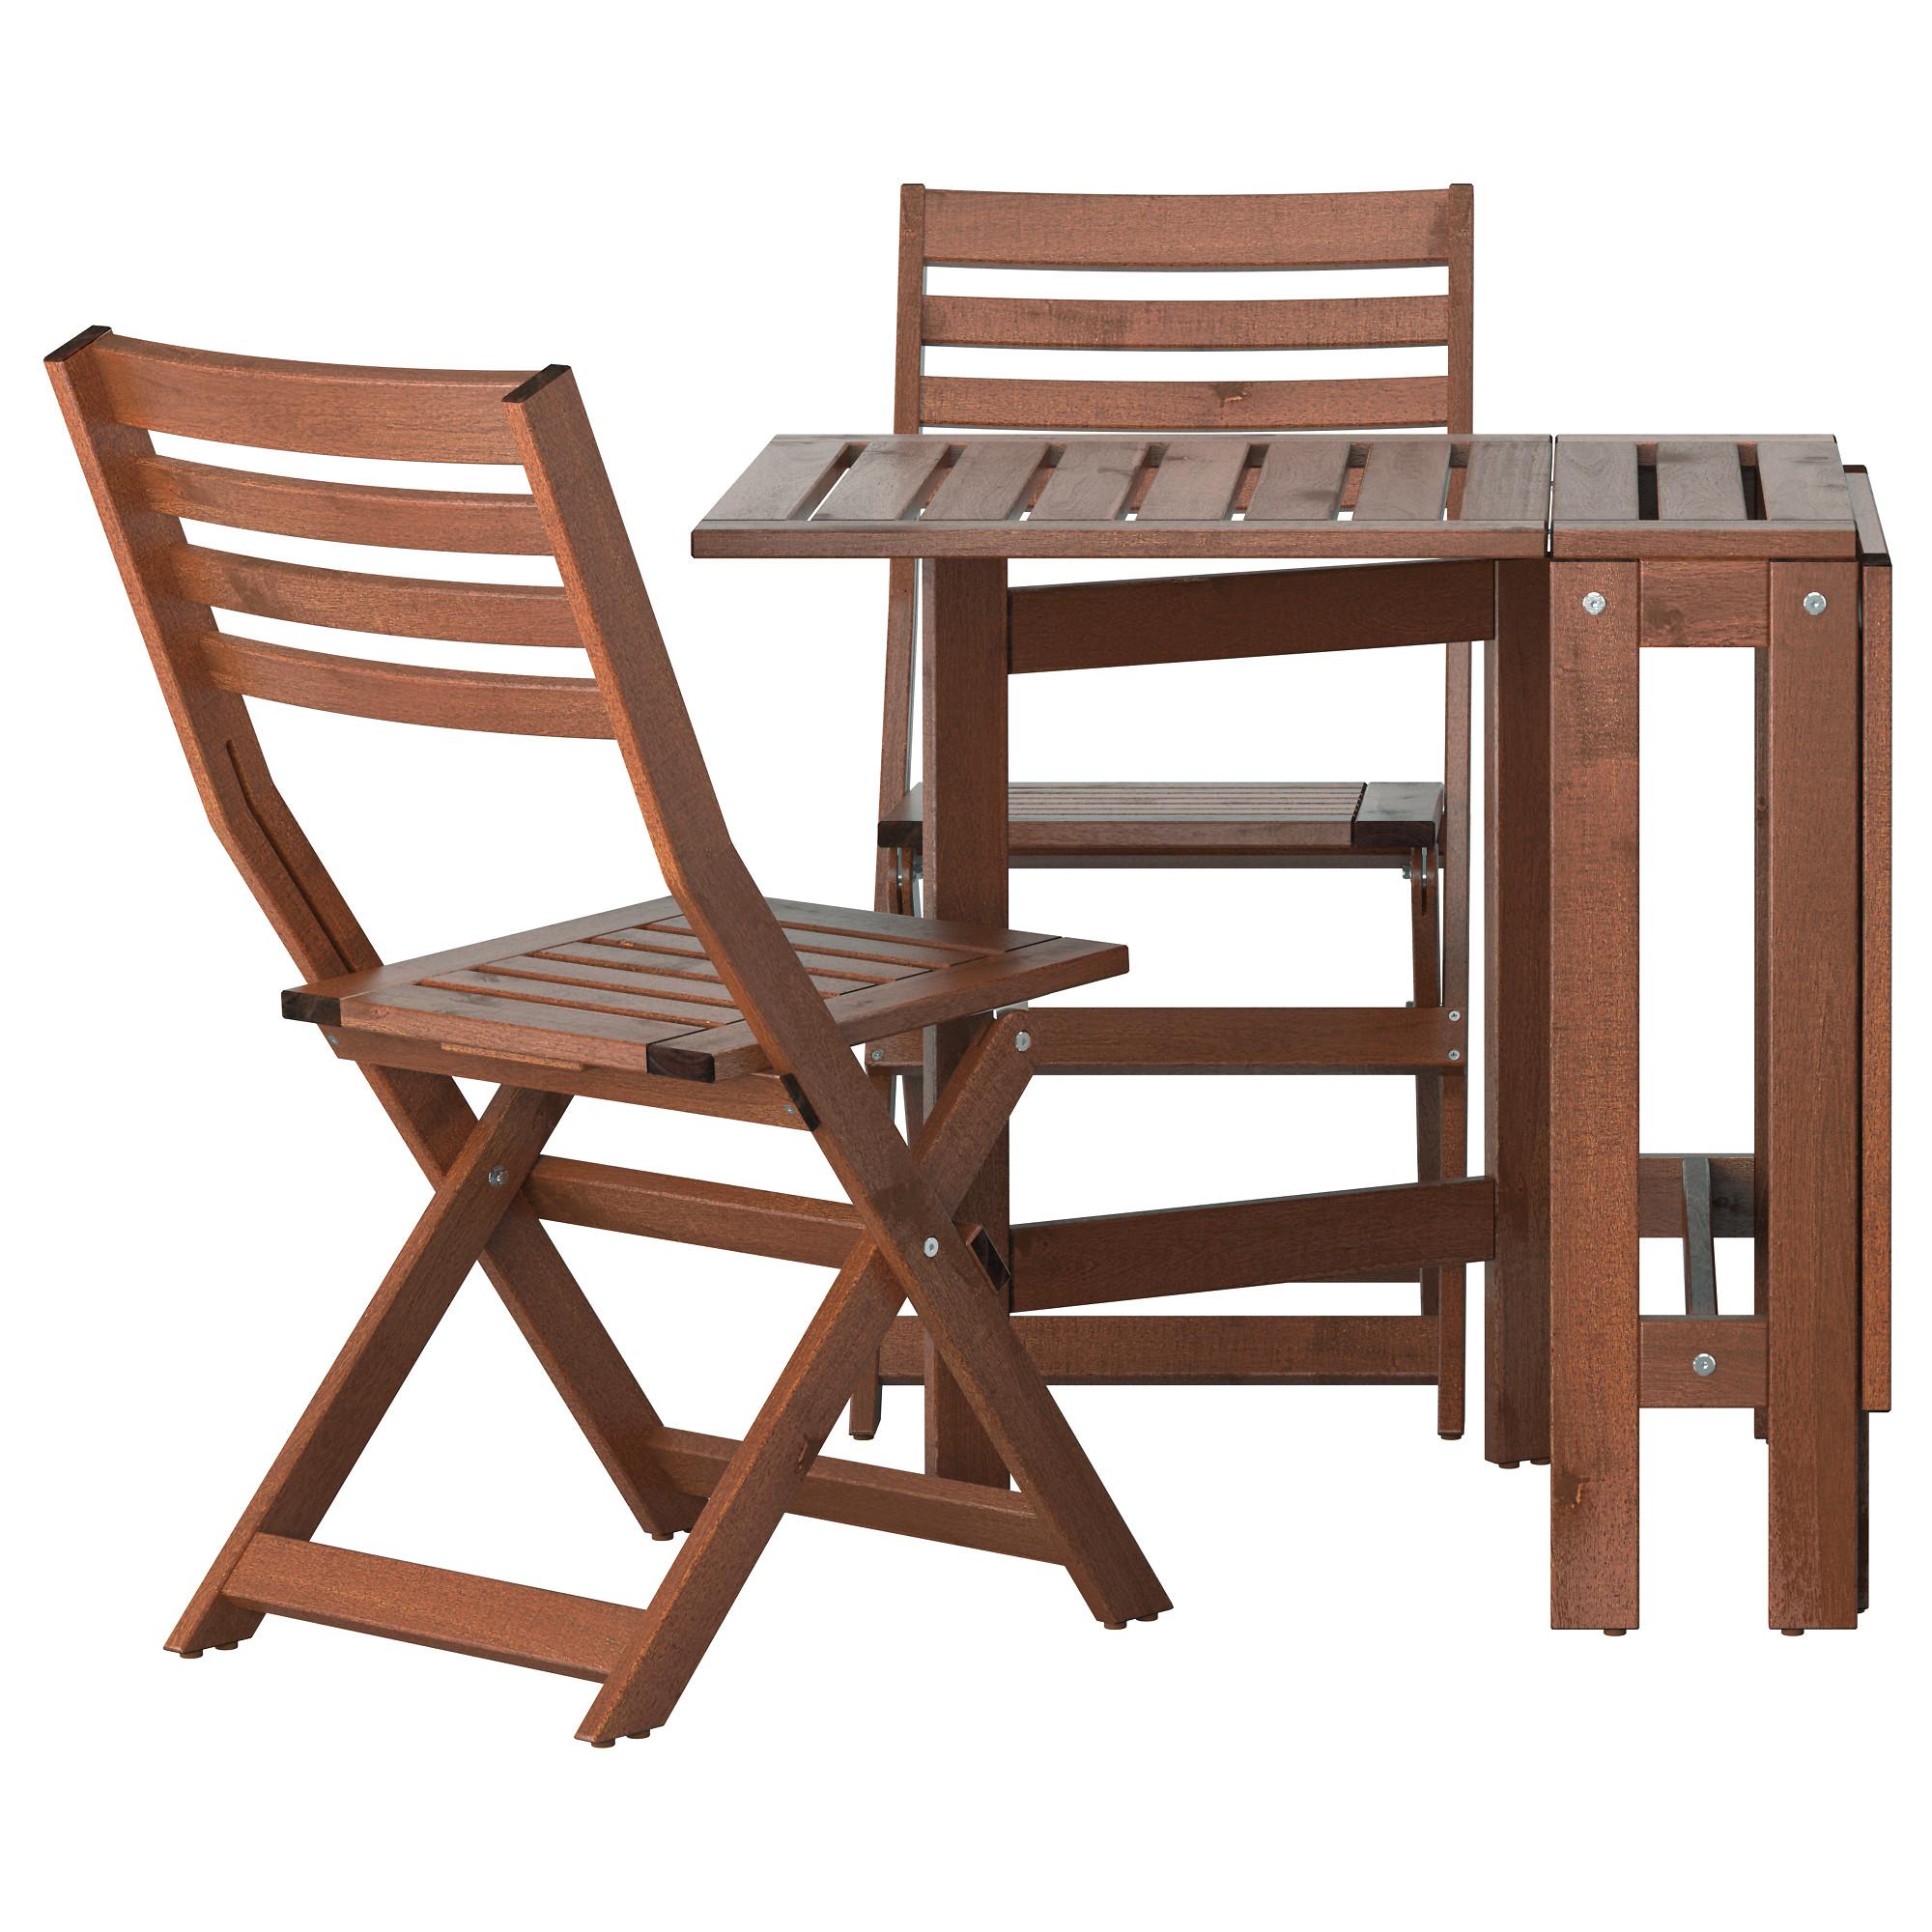 2 - Tavolini da giardino ikea ...